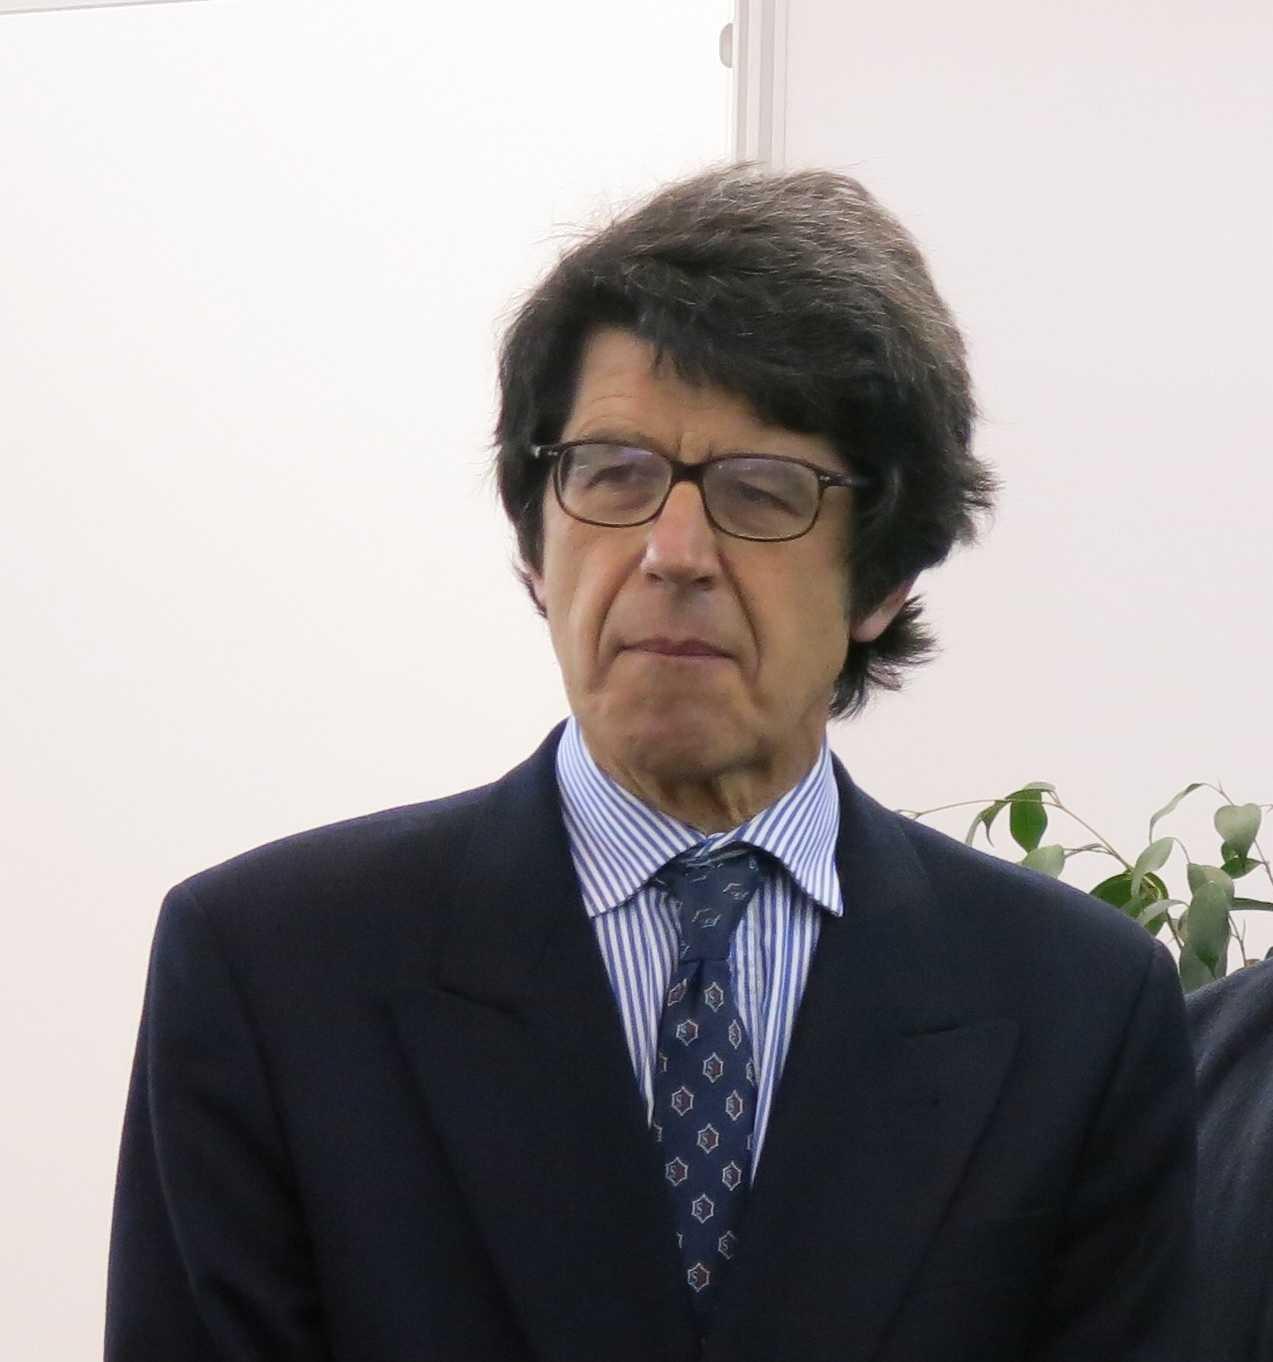 Paul Hubert